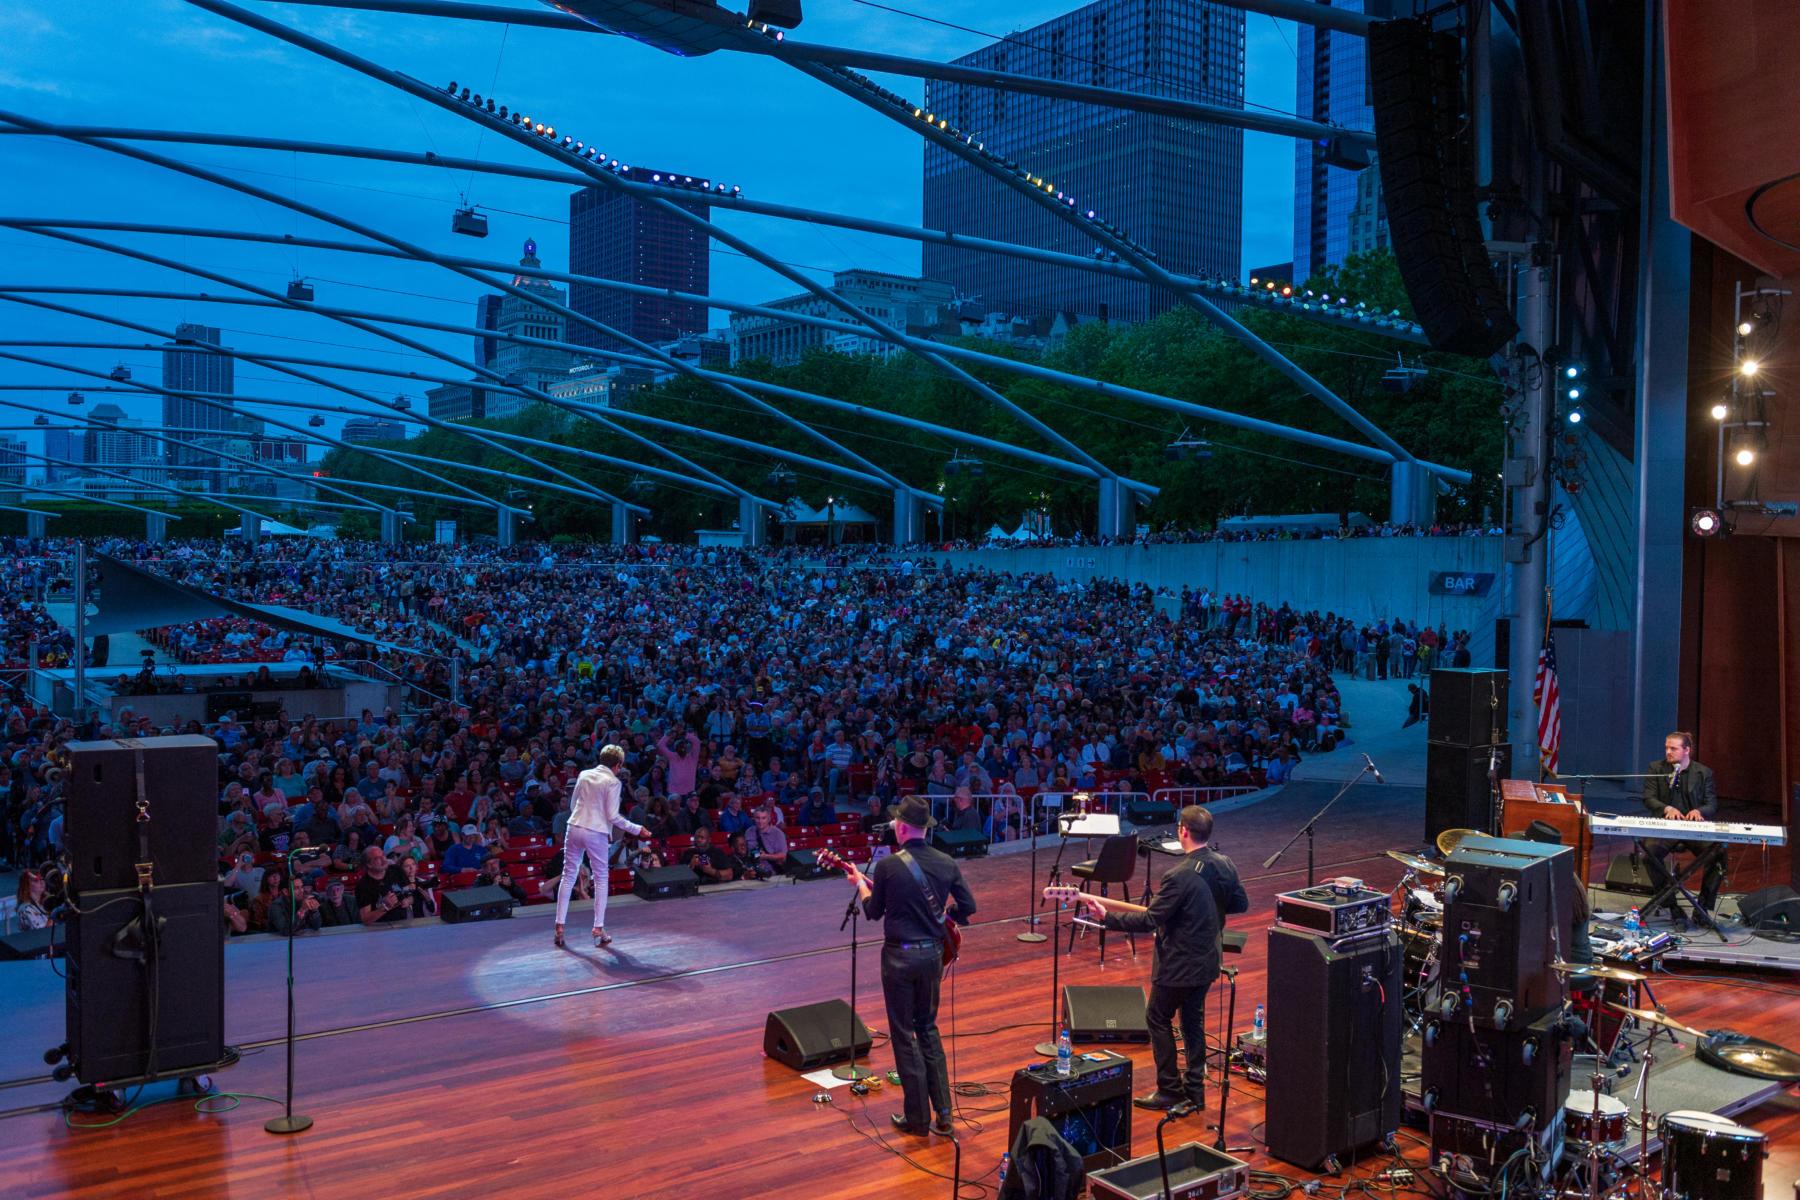 The 2019 Chicago Blues Festival in Millennium Park, June 2019.